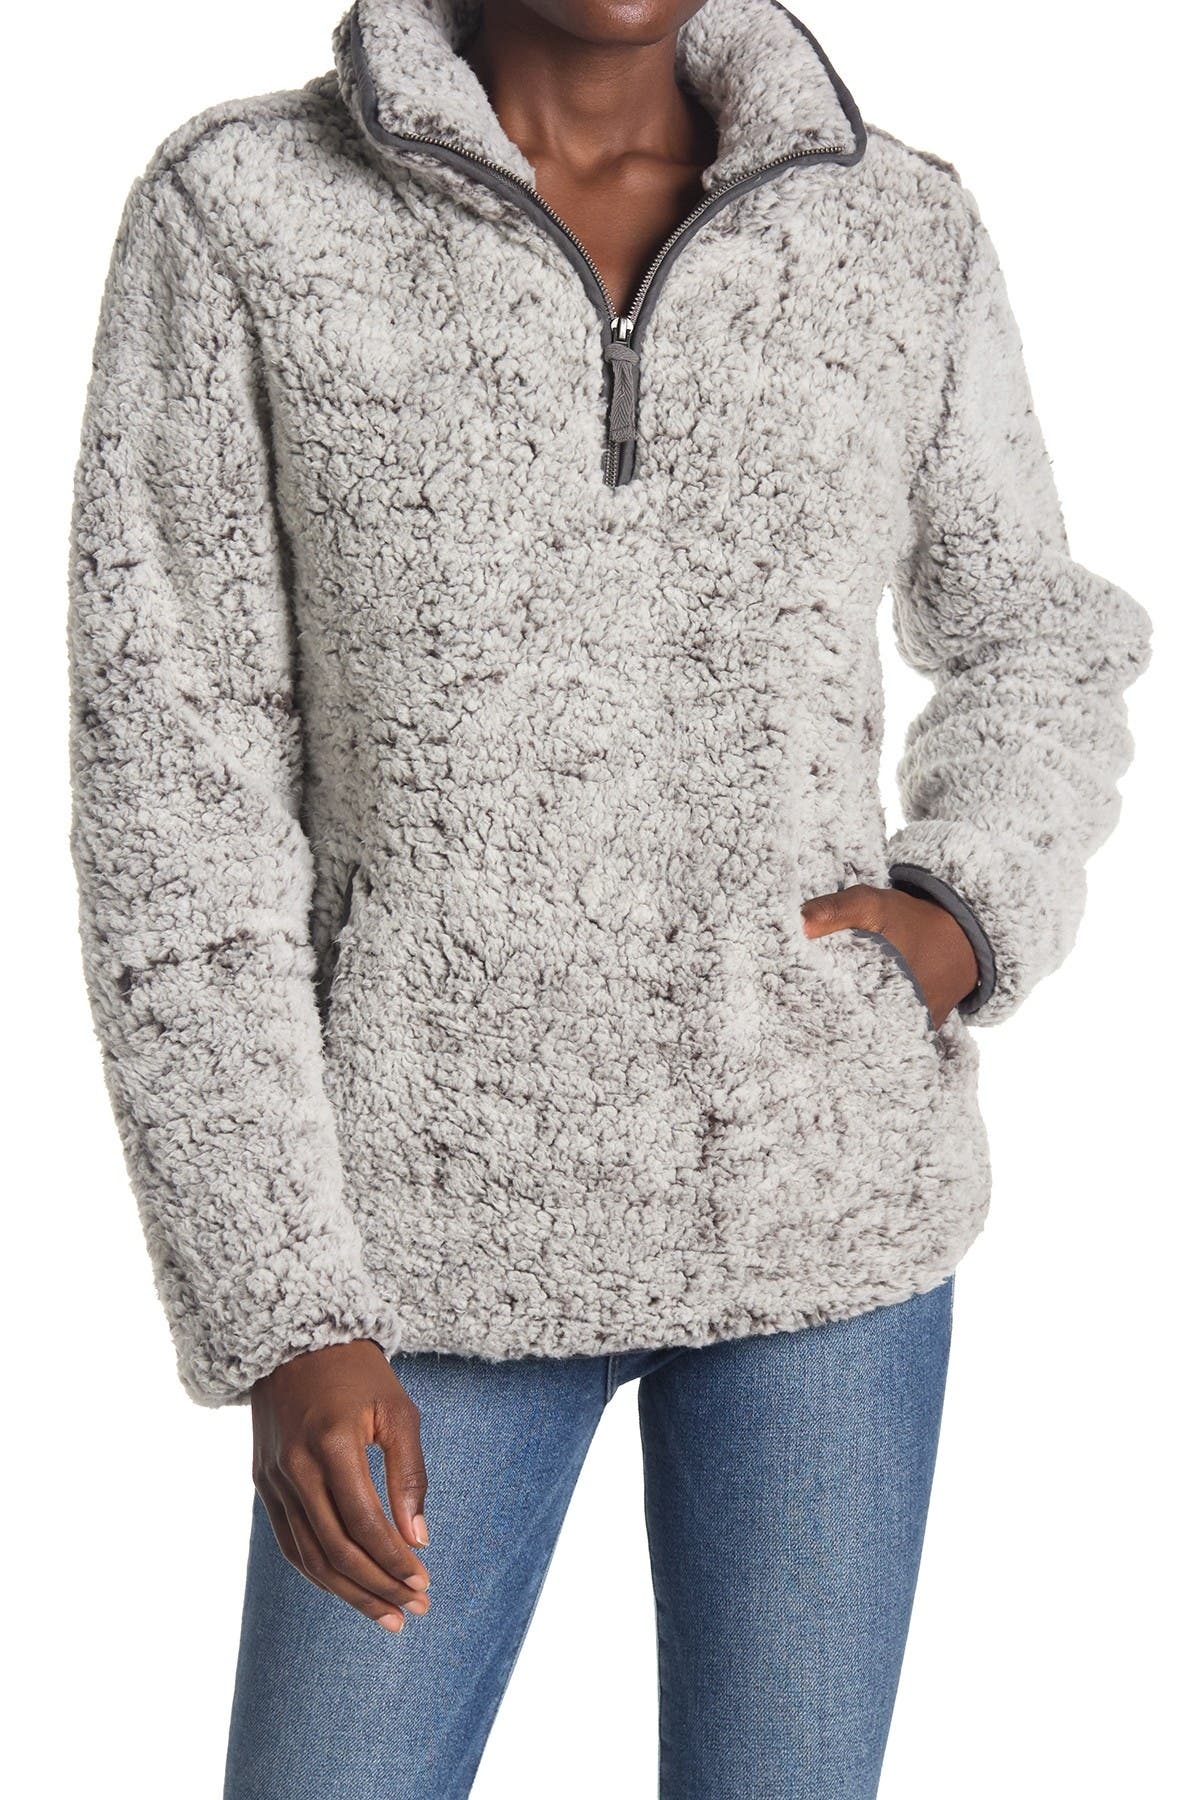 Image of THREAD AND SUPPLY Seven Wonders Fleece Quarter Zip Pullover